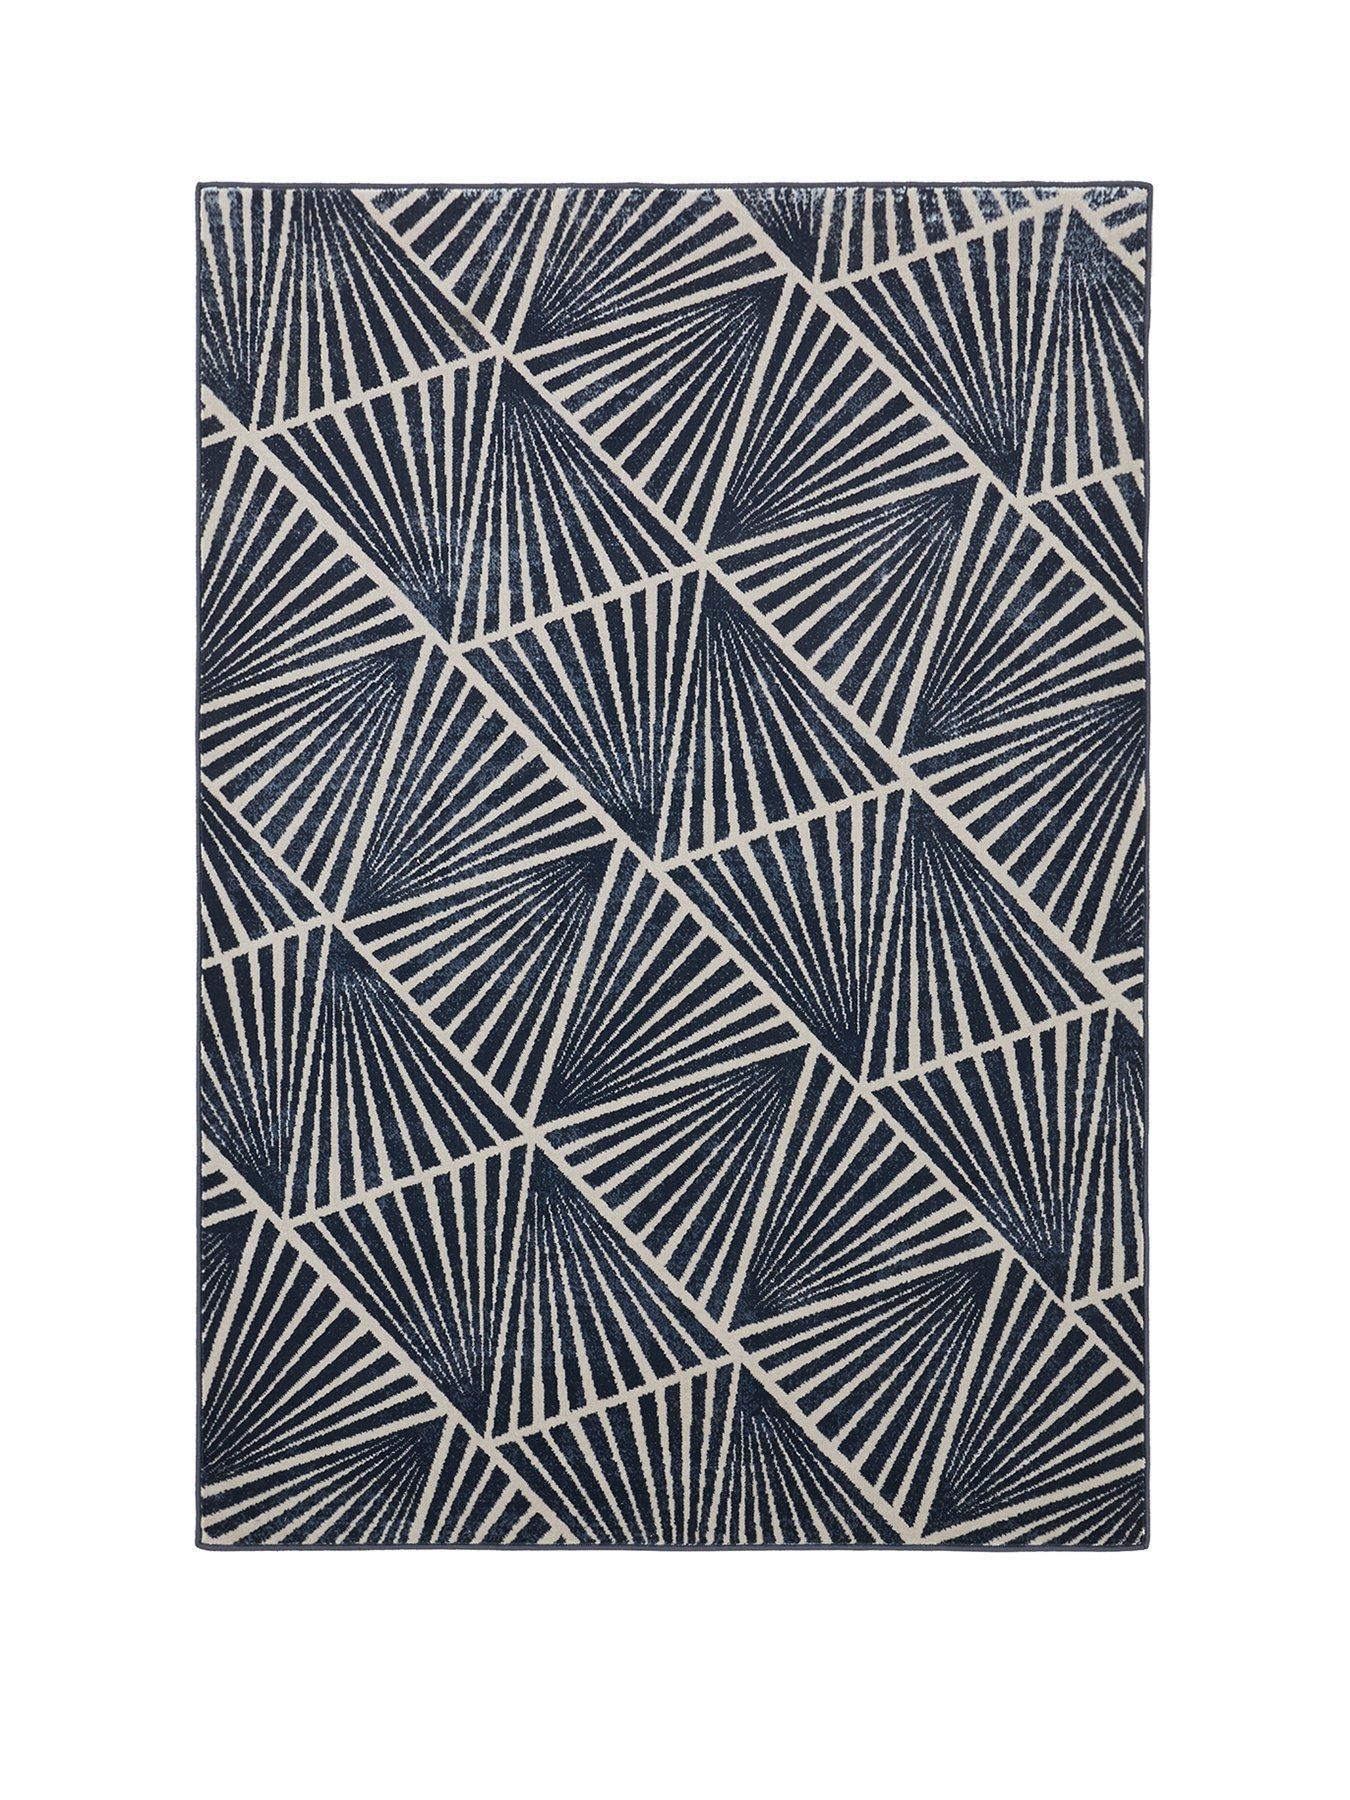 Black White Patch Work Diamond Large Rug 80cm x 150cm Modern New Design 339